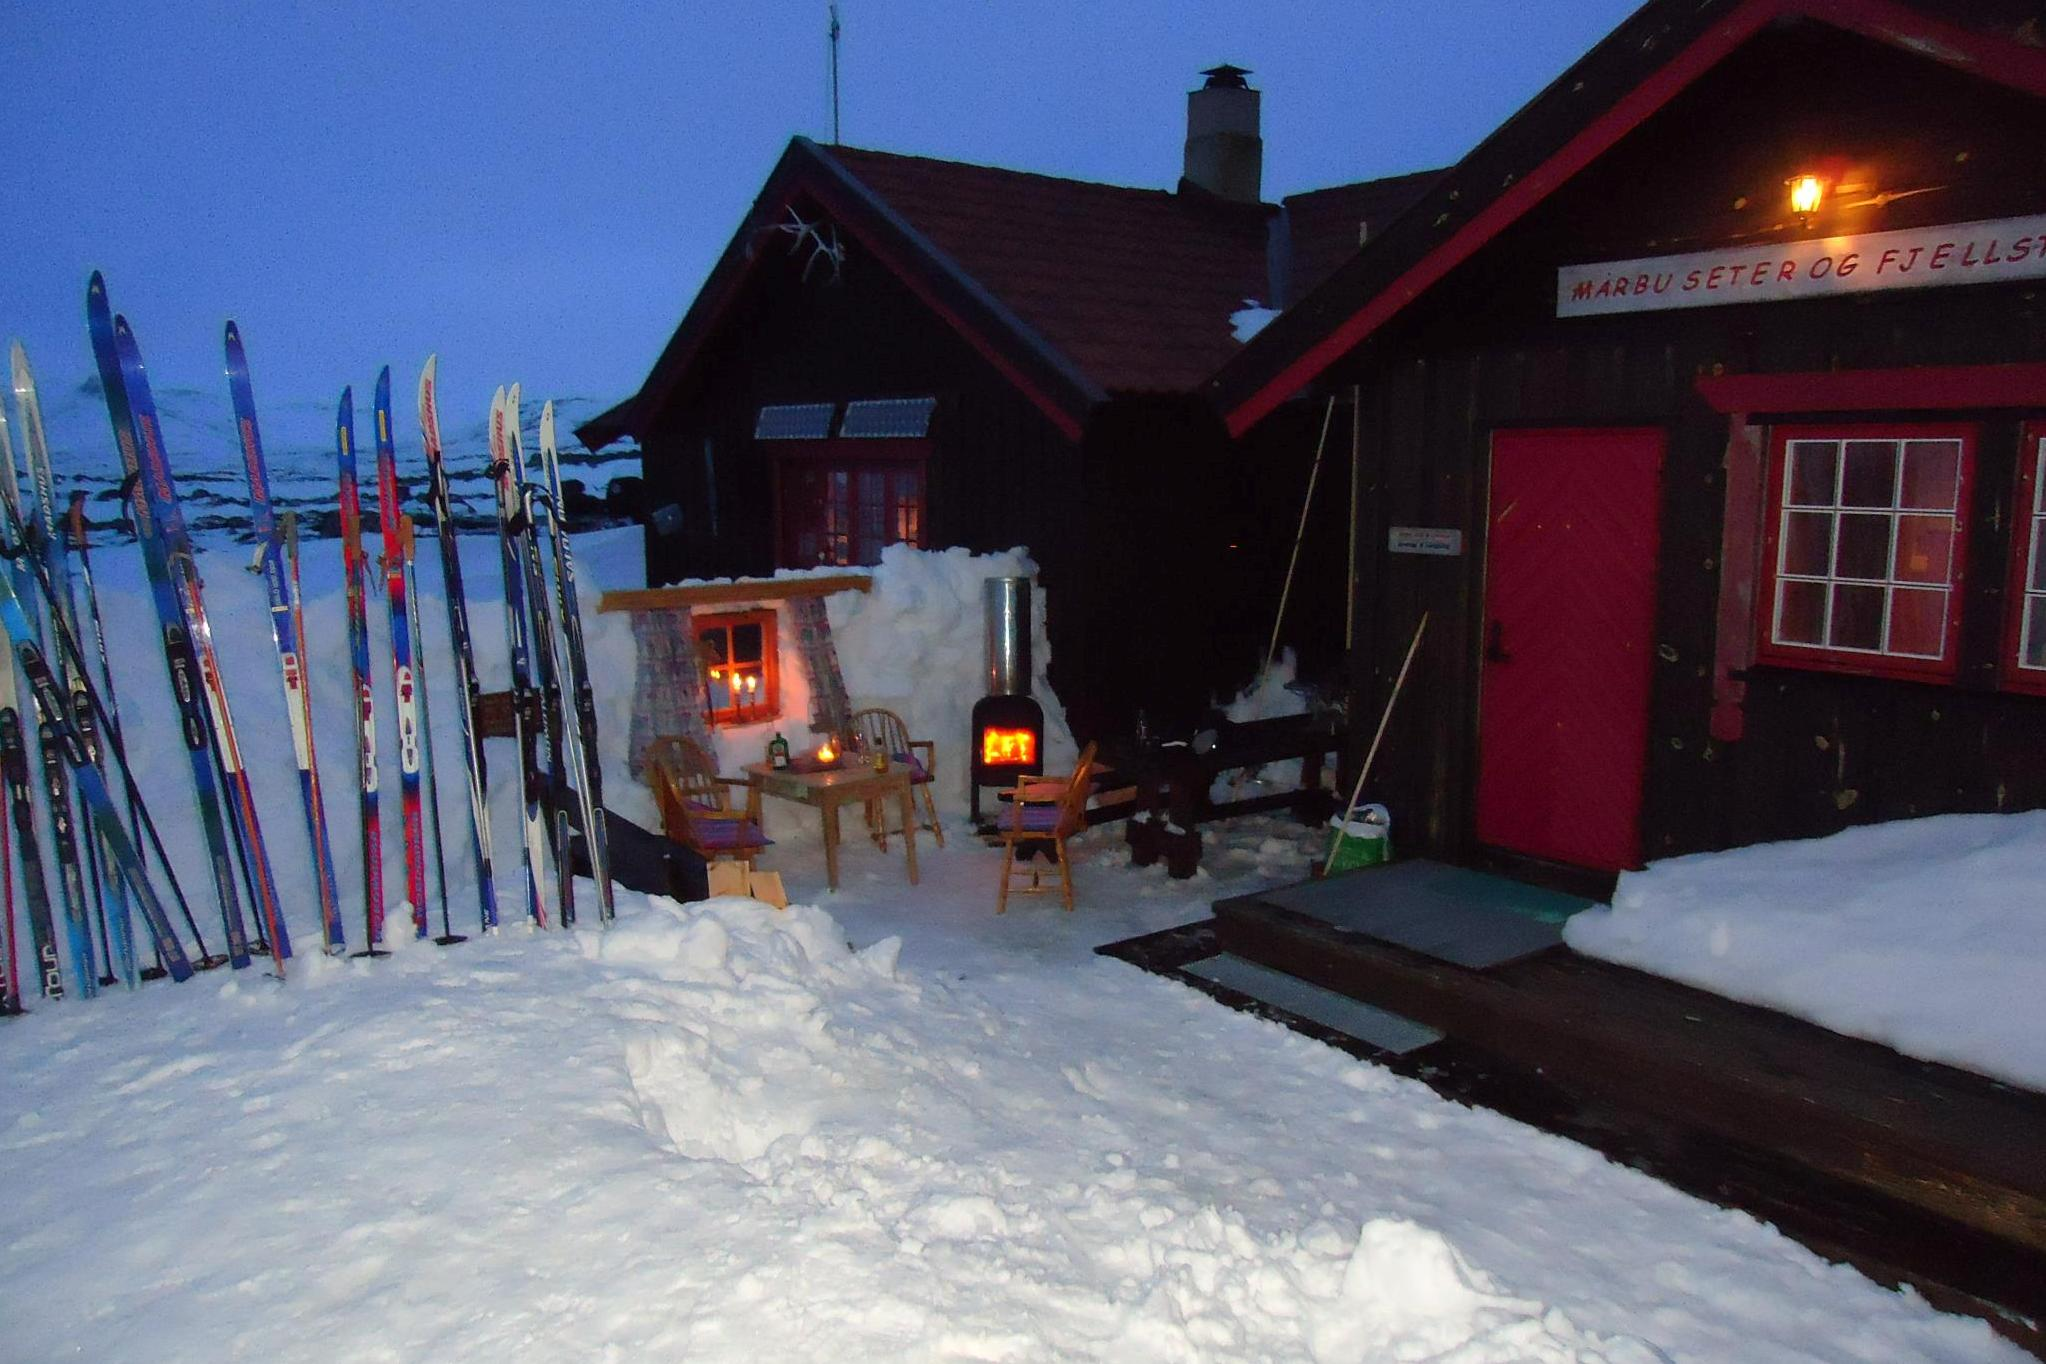 © Mårbu Seter & Fjellstue